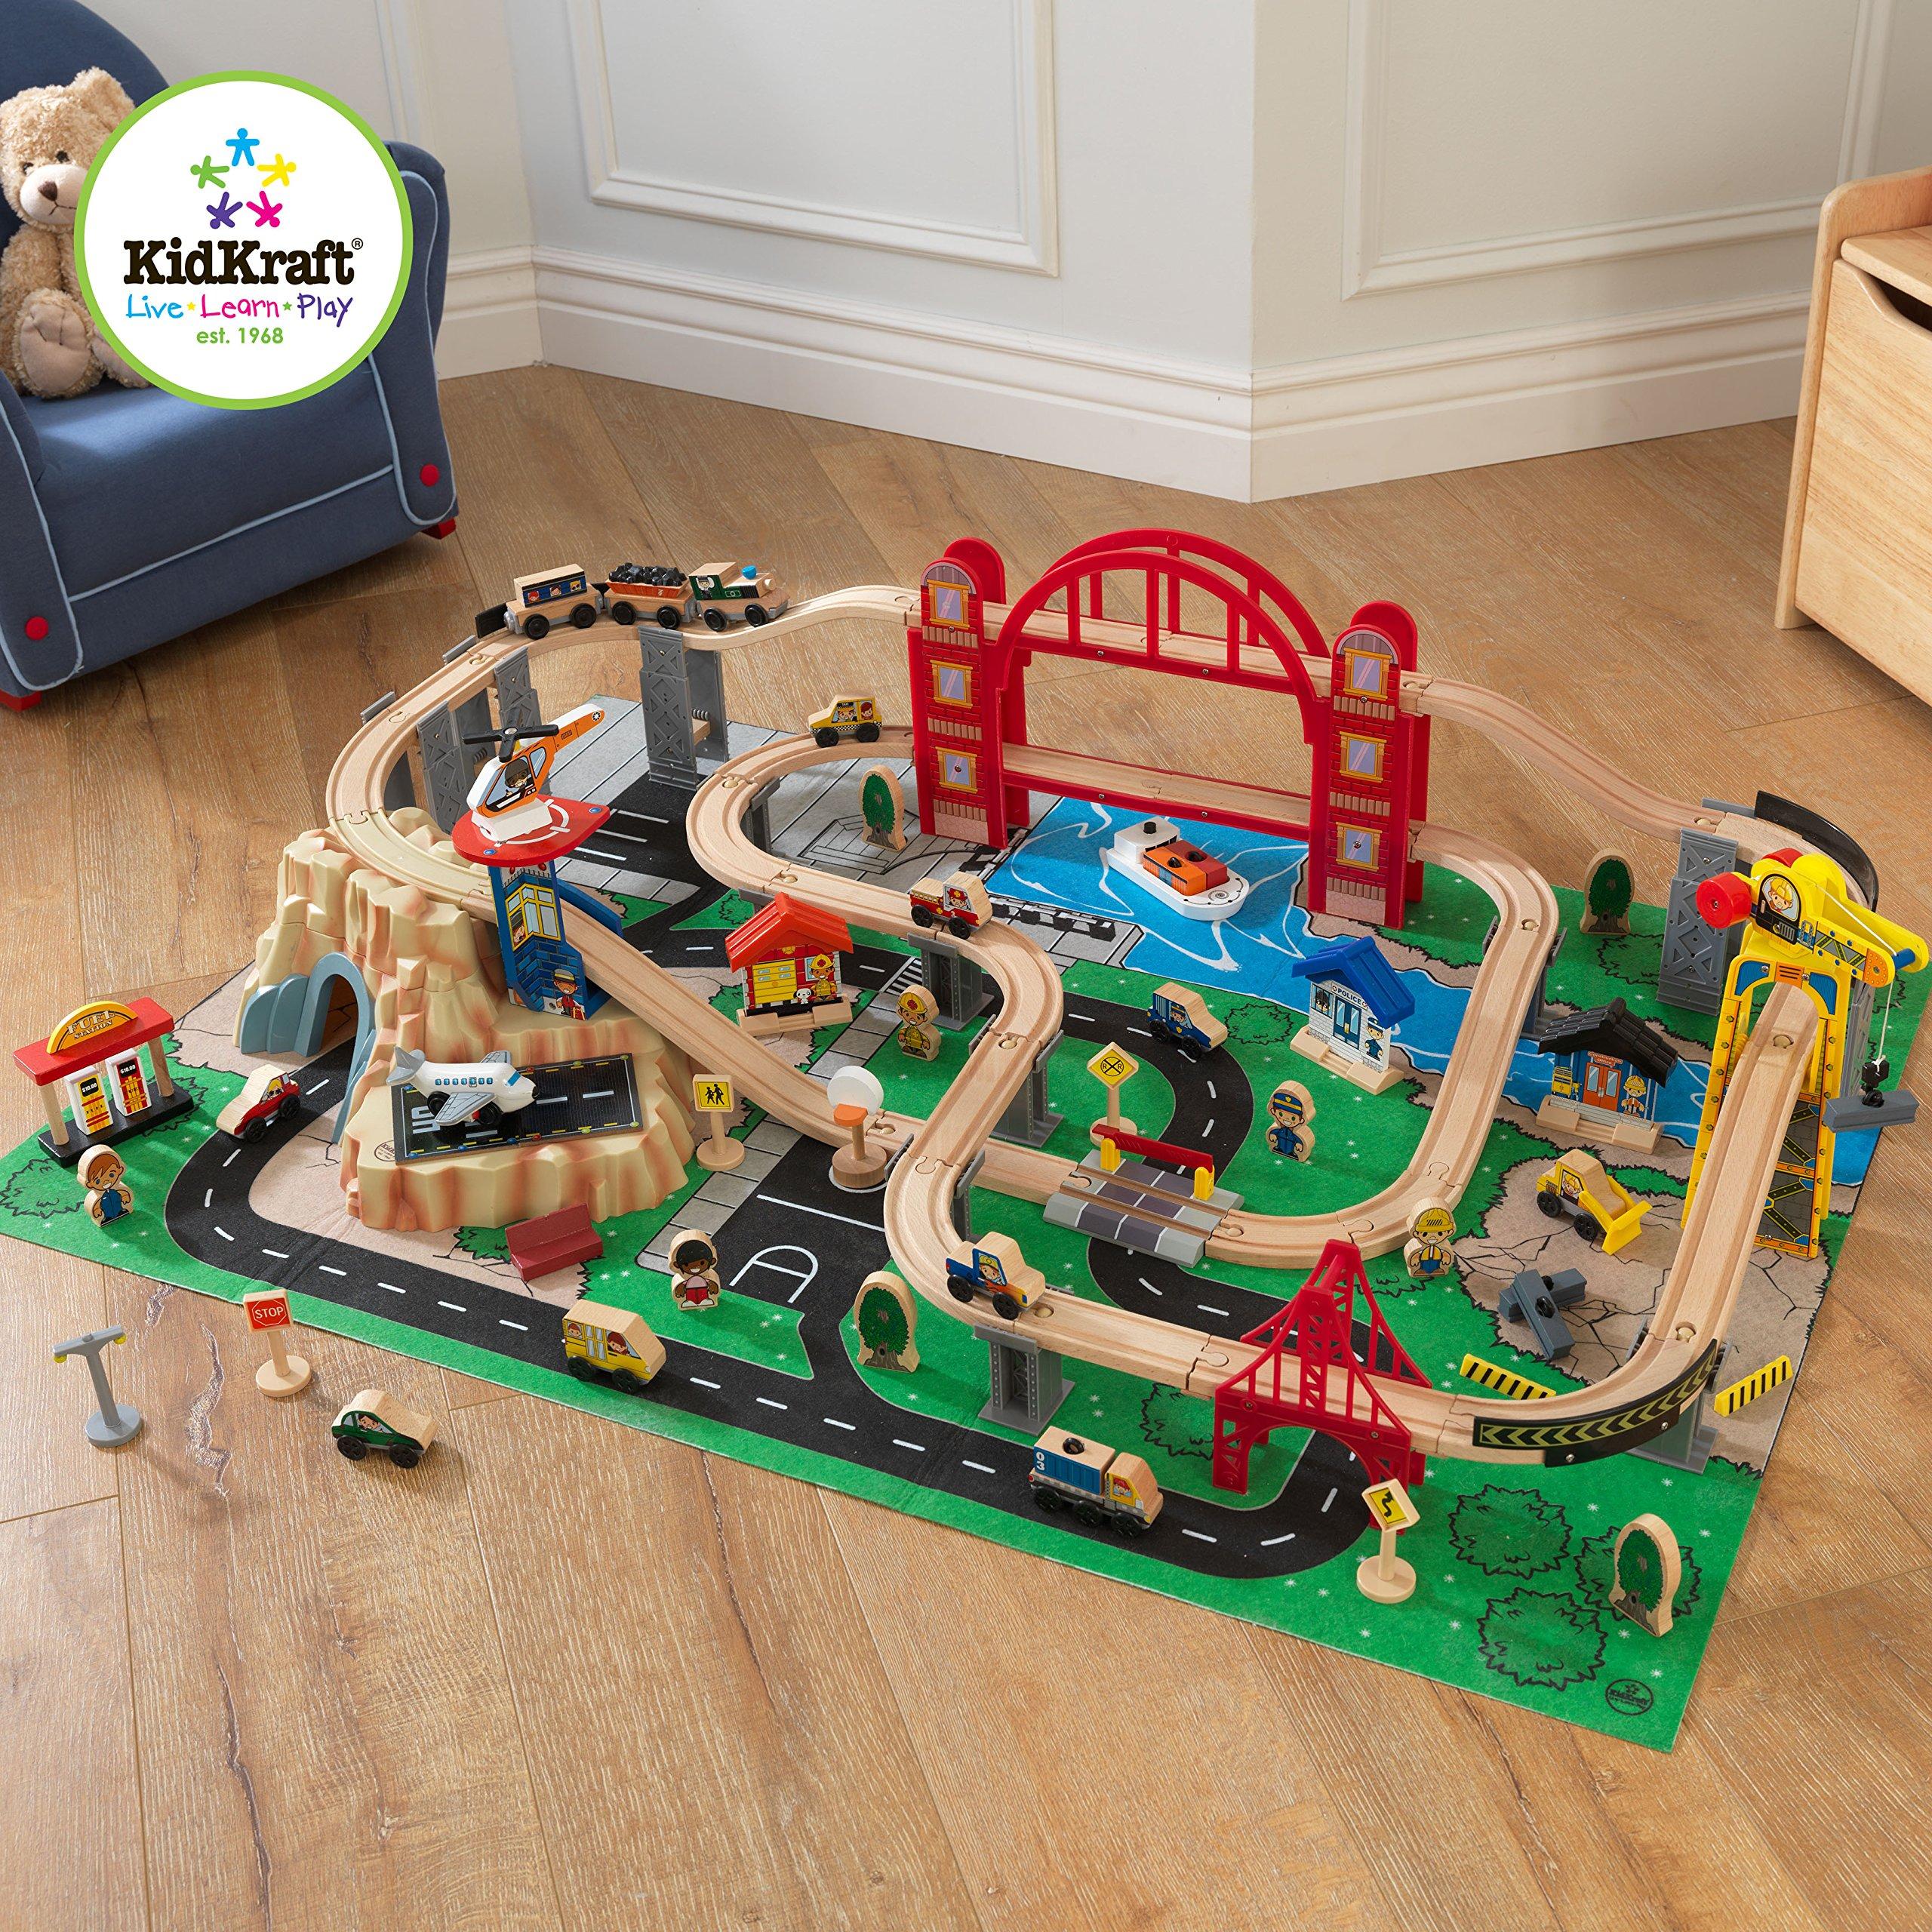 Kidkraft Metropolis Train Set with RollUp Felt Play Mat ...